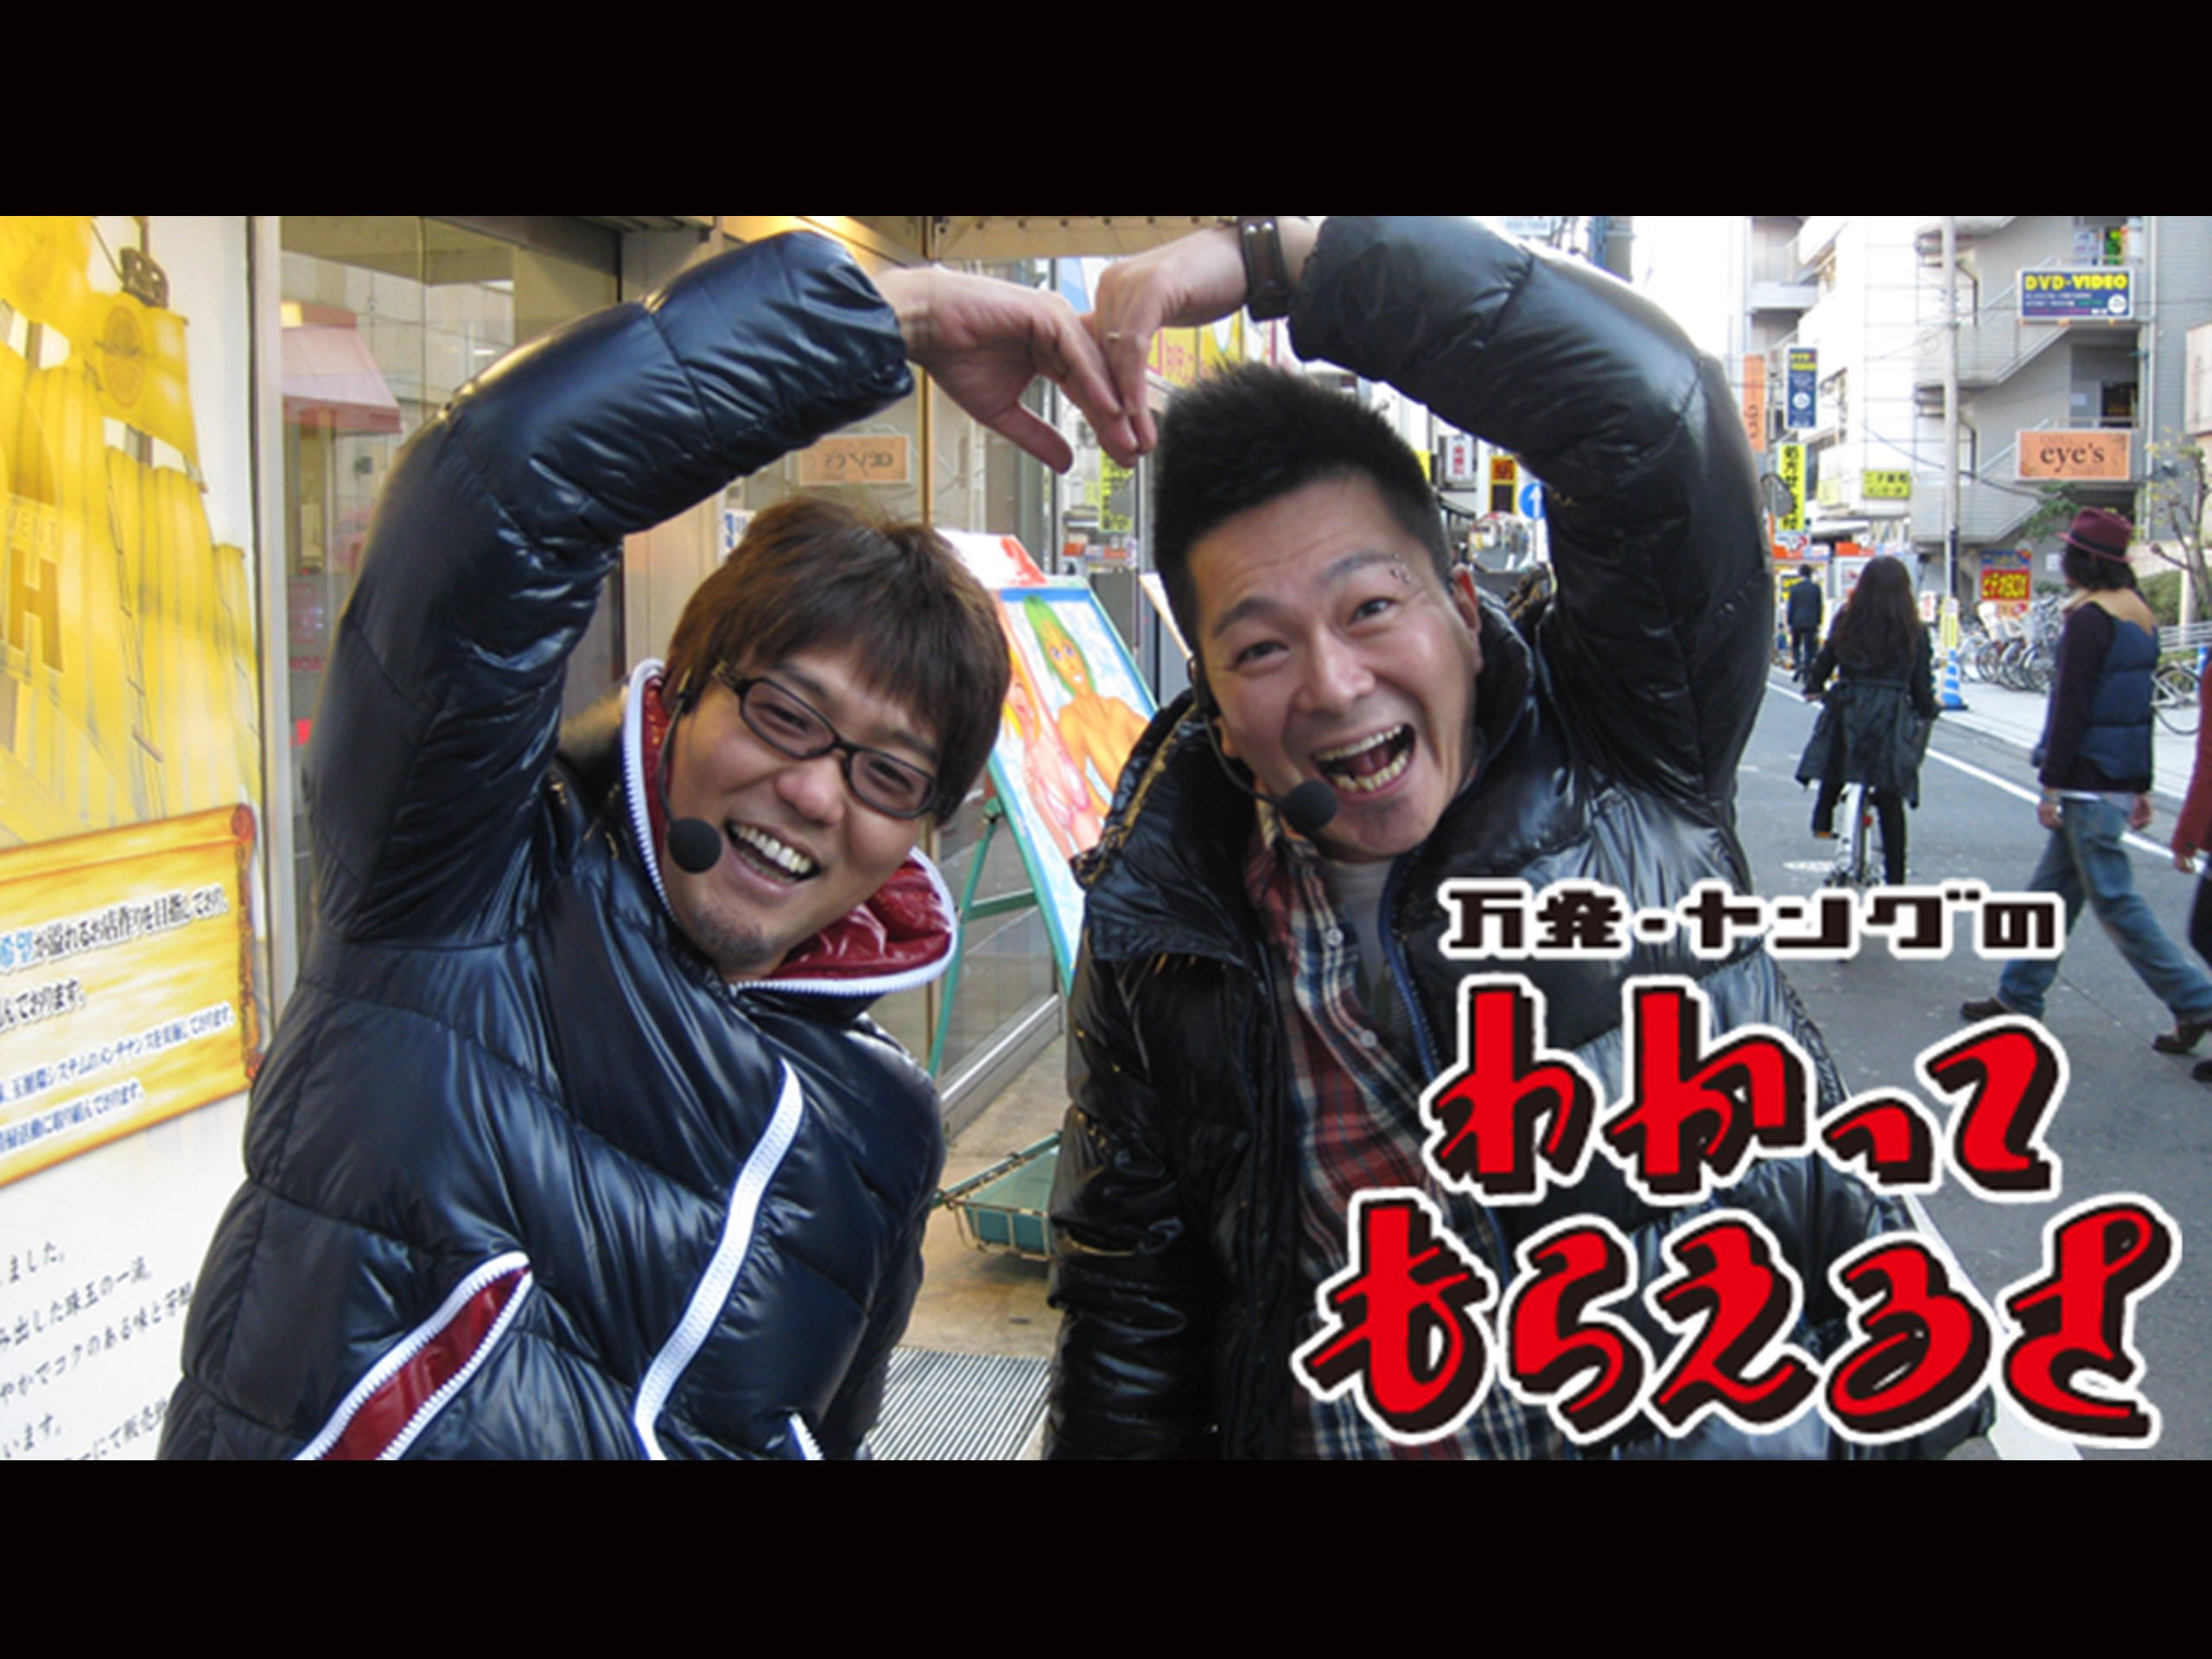 Amazon.co.jp: 万発・ヤングのわかってもらえるさを観る | Prime Video